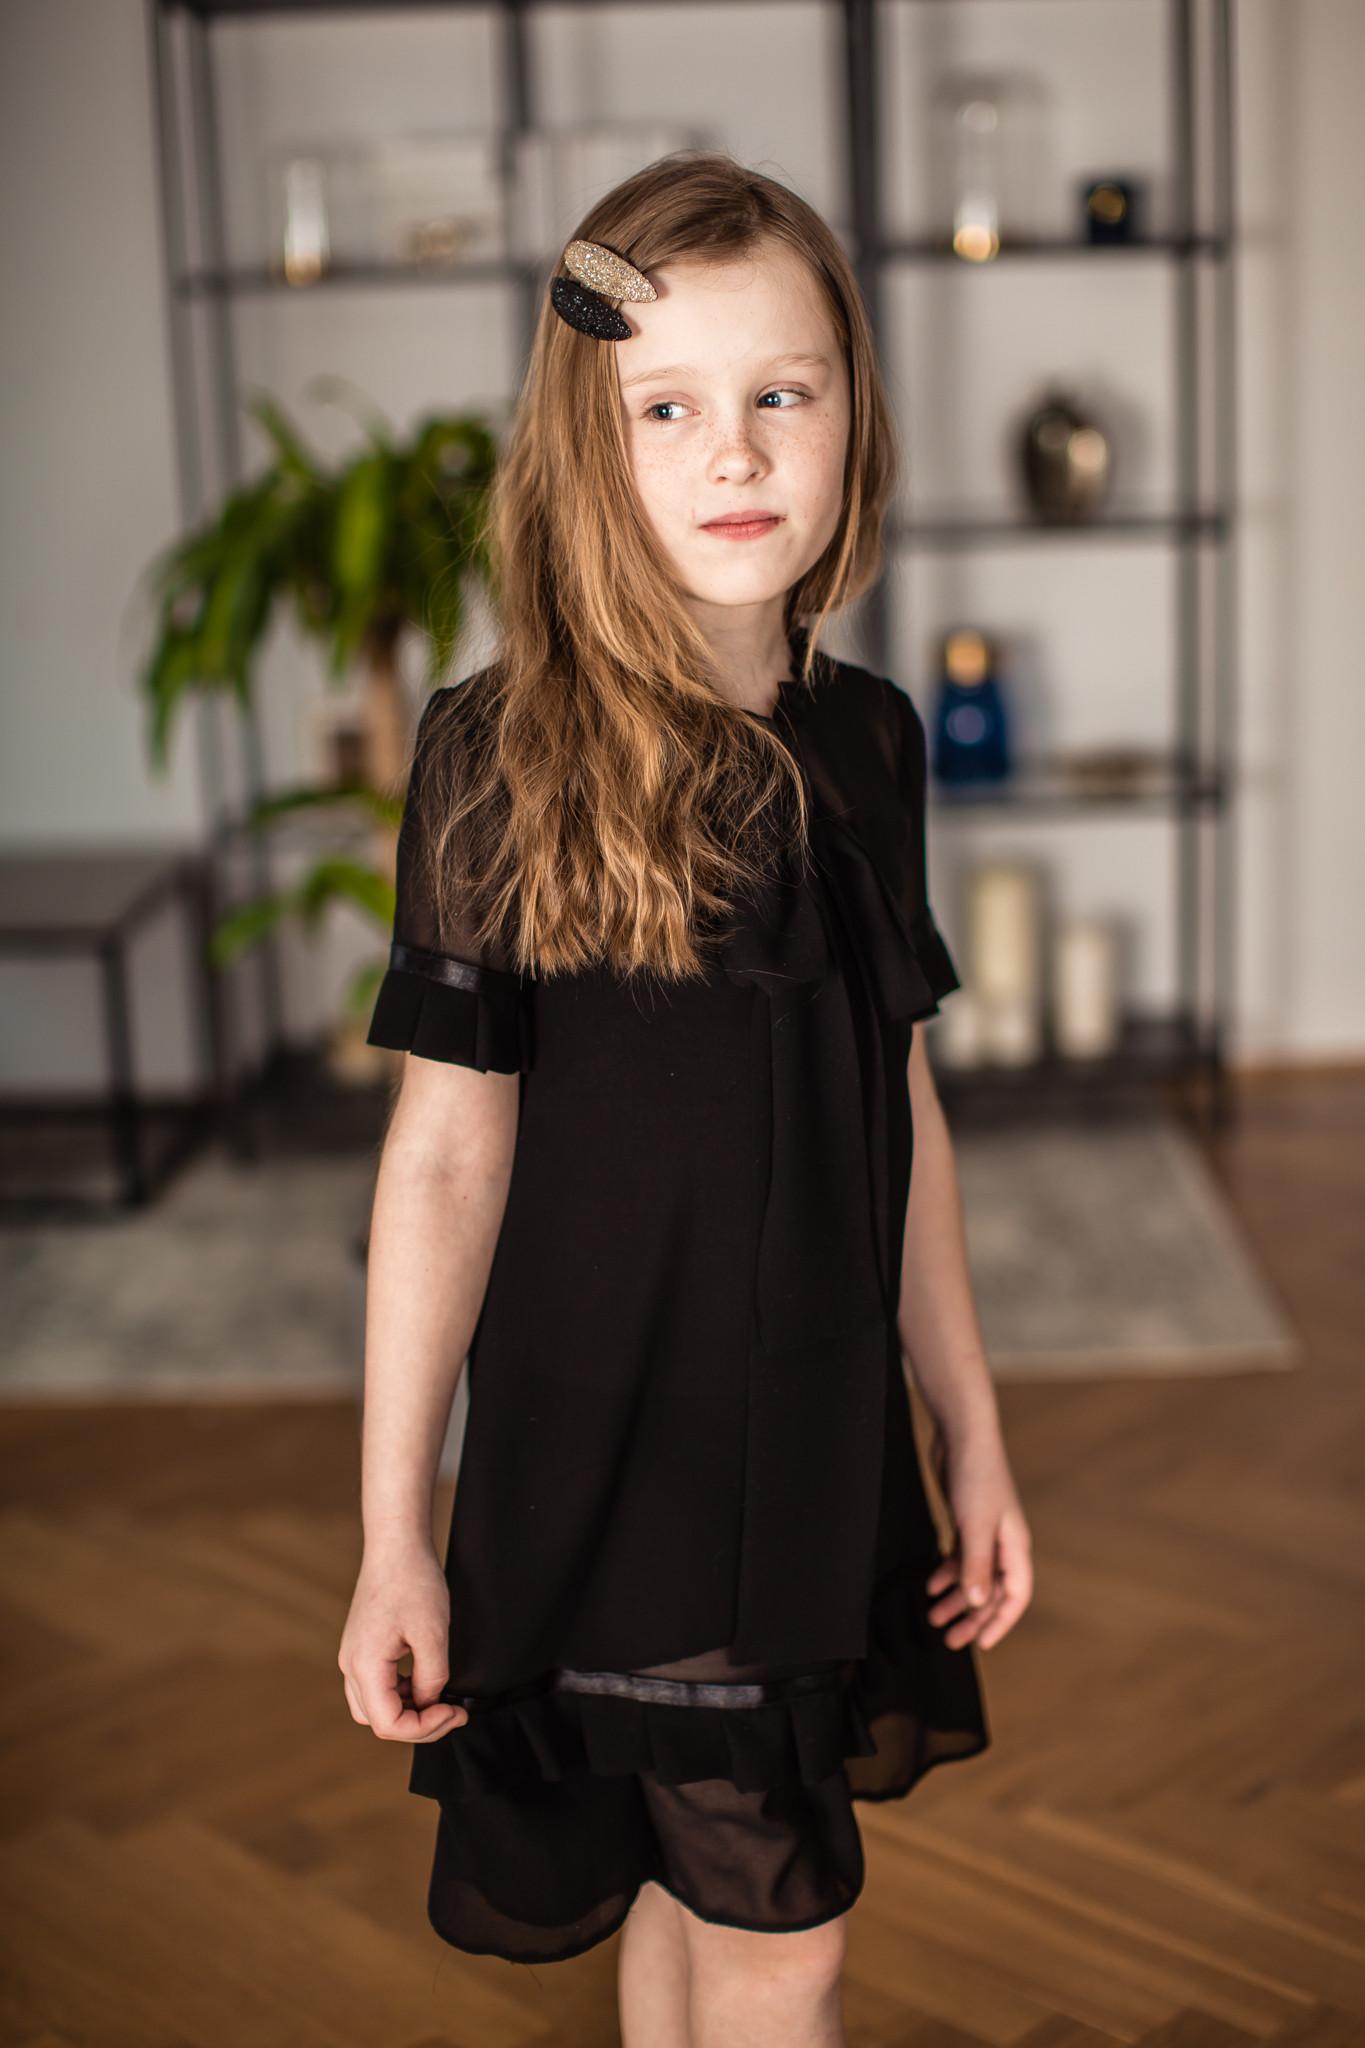 Sukienka czarna z kokardą - Domino.little.dress